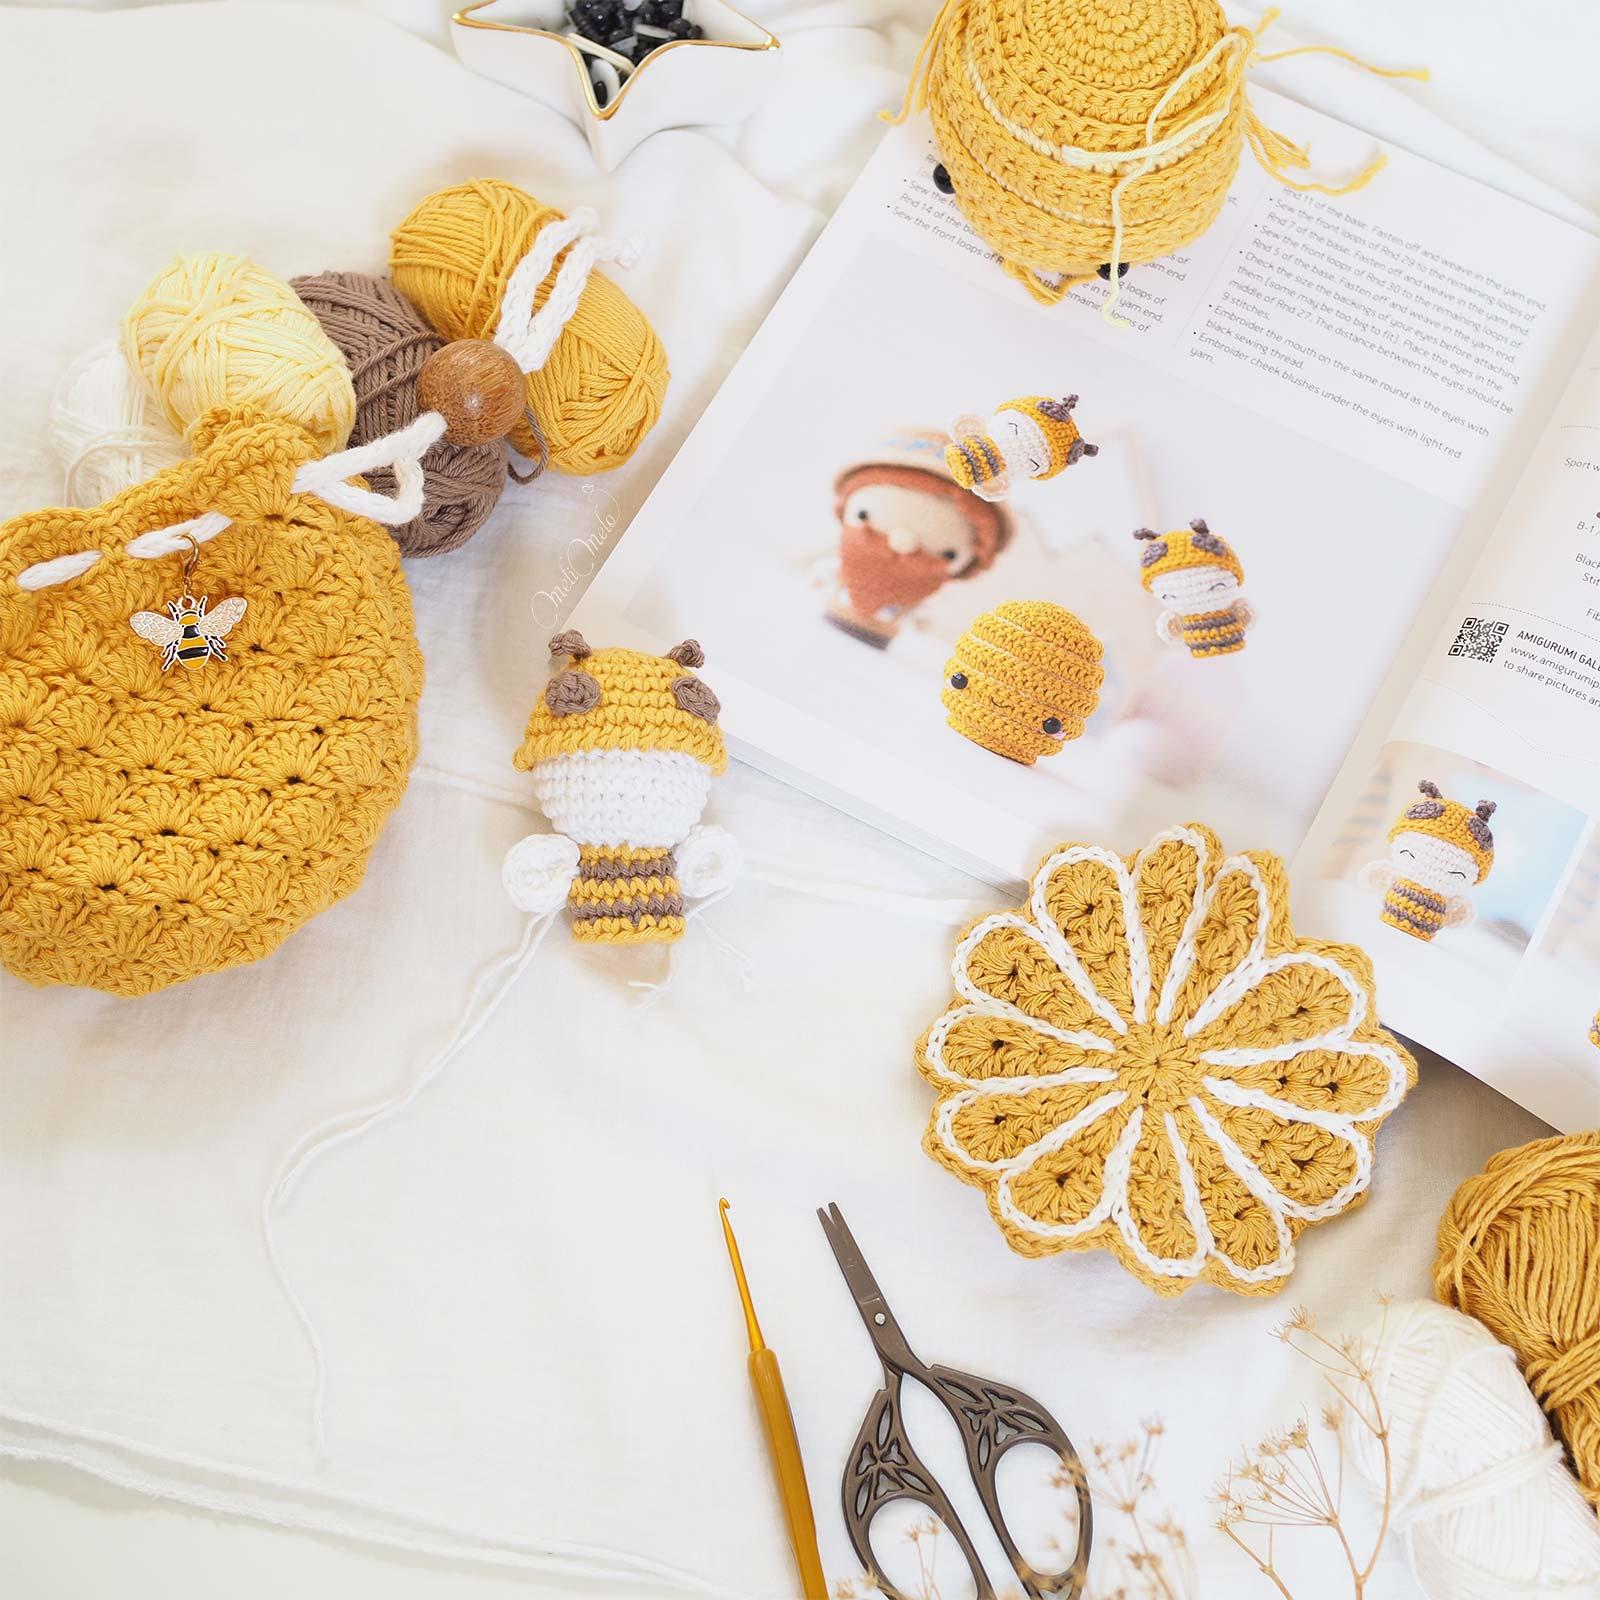 crochet-mini-kingdom-aradiyatoys-abeille-laboutiquedemelimelo